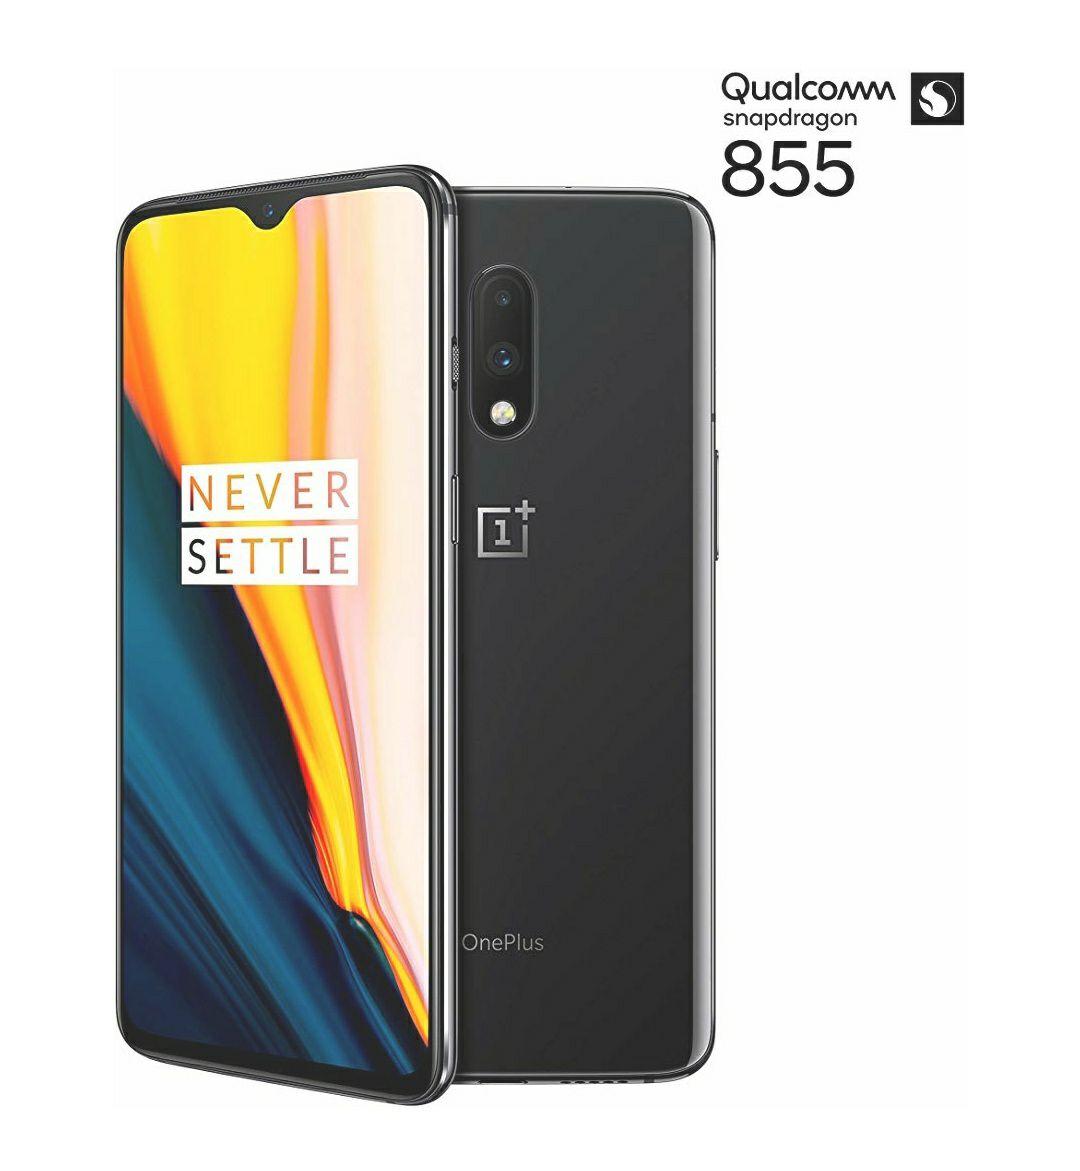 **REDUCED!!** Used Like New OnePlus 7 8 GB RAM 256 GB UK SIM-Free Smartphone - Mirror Grey £359.82 @ Amazon Warehouse